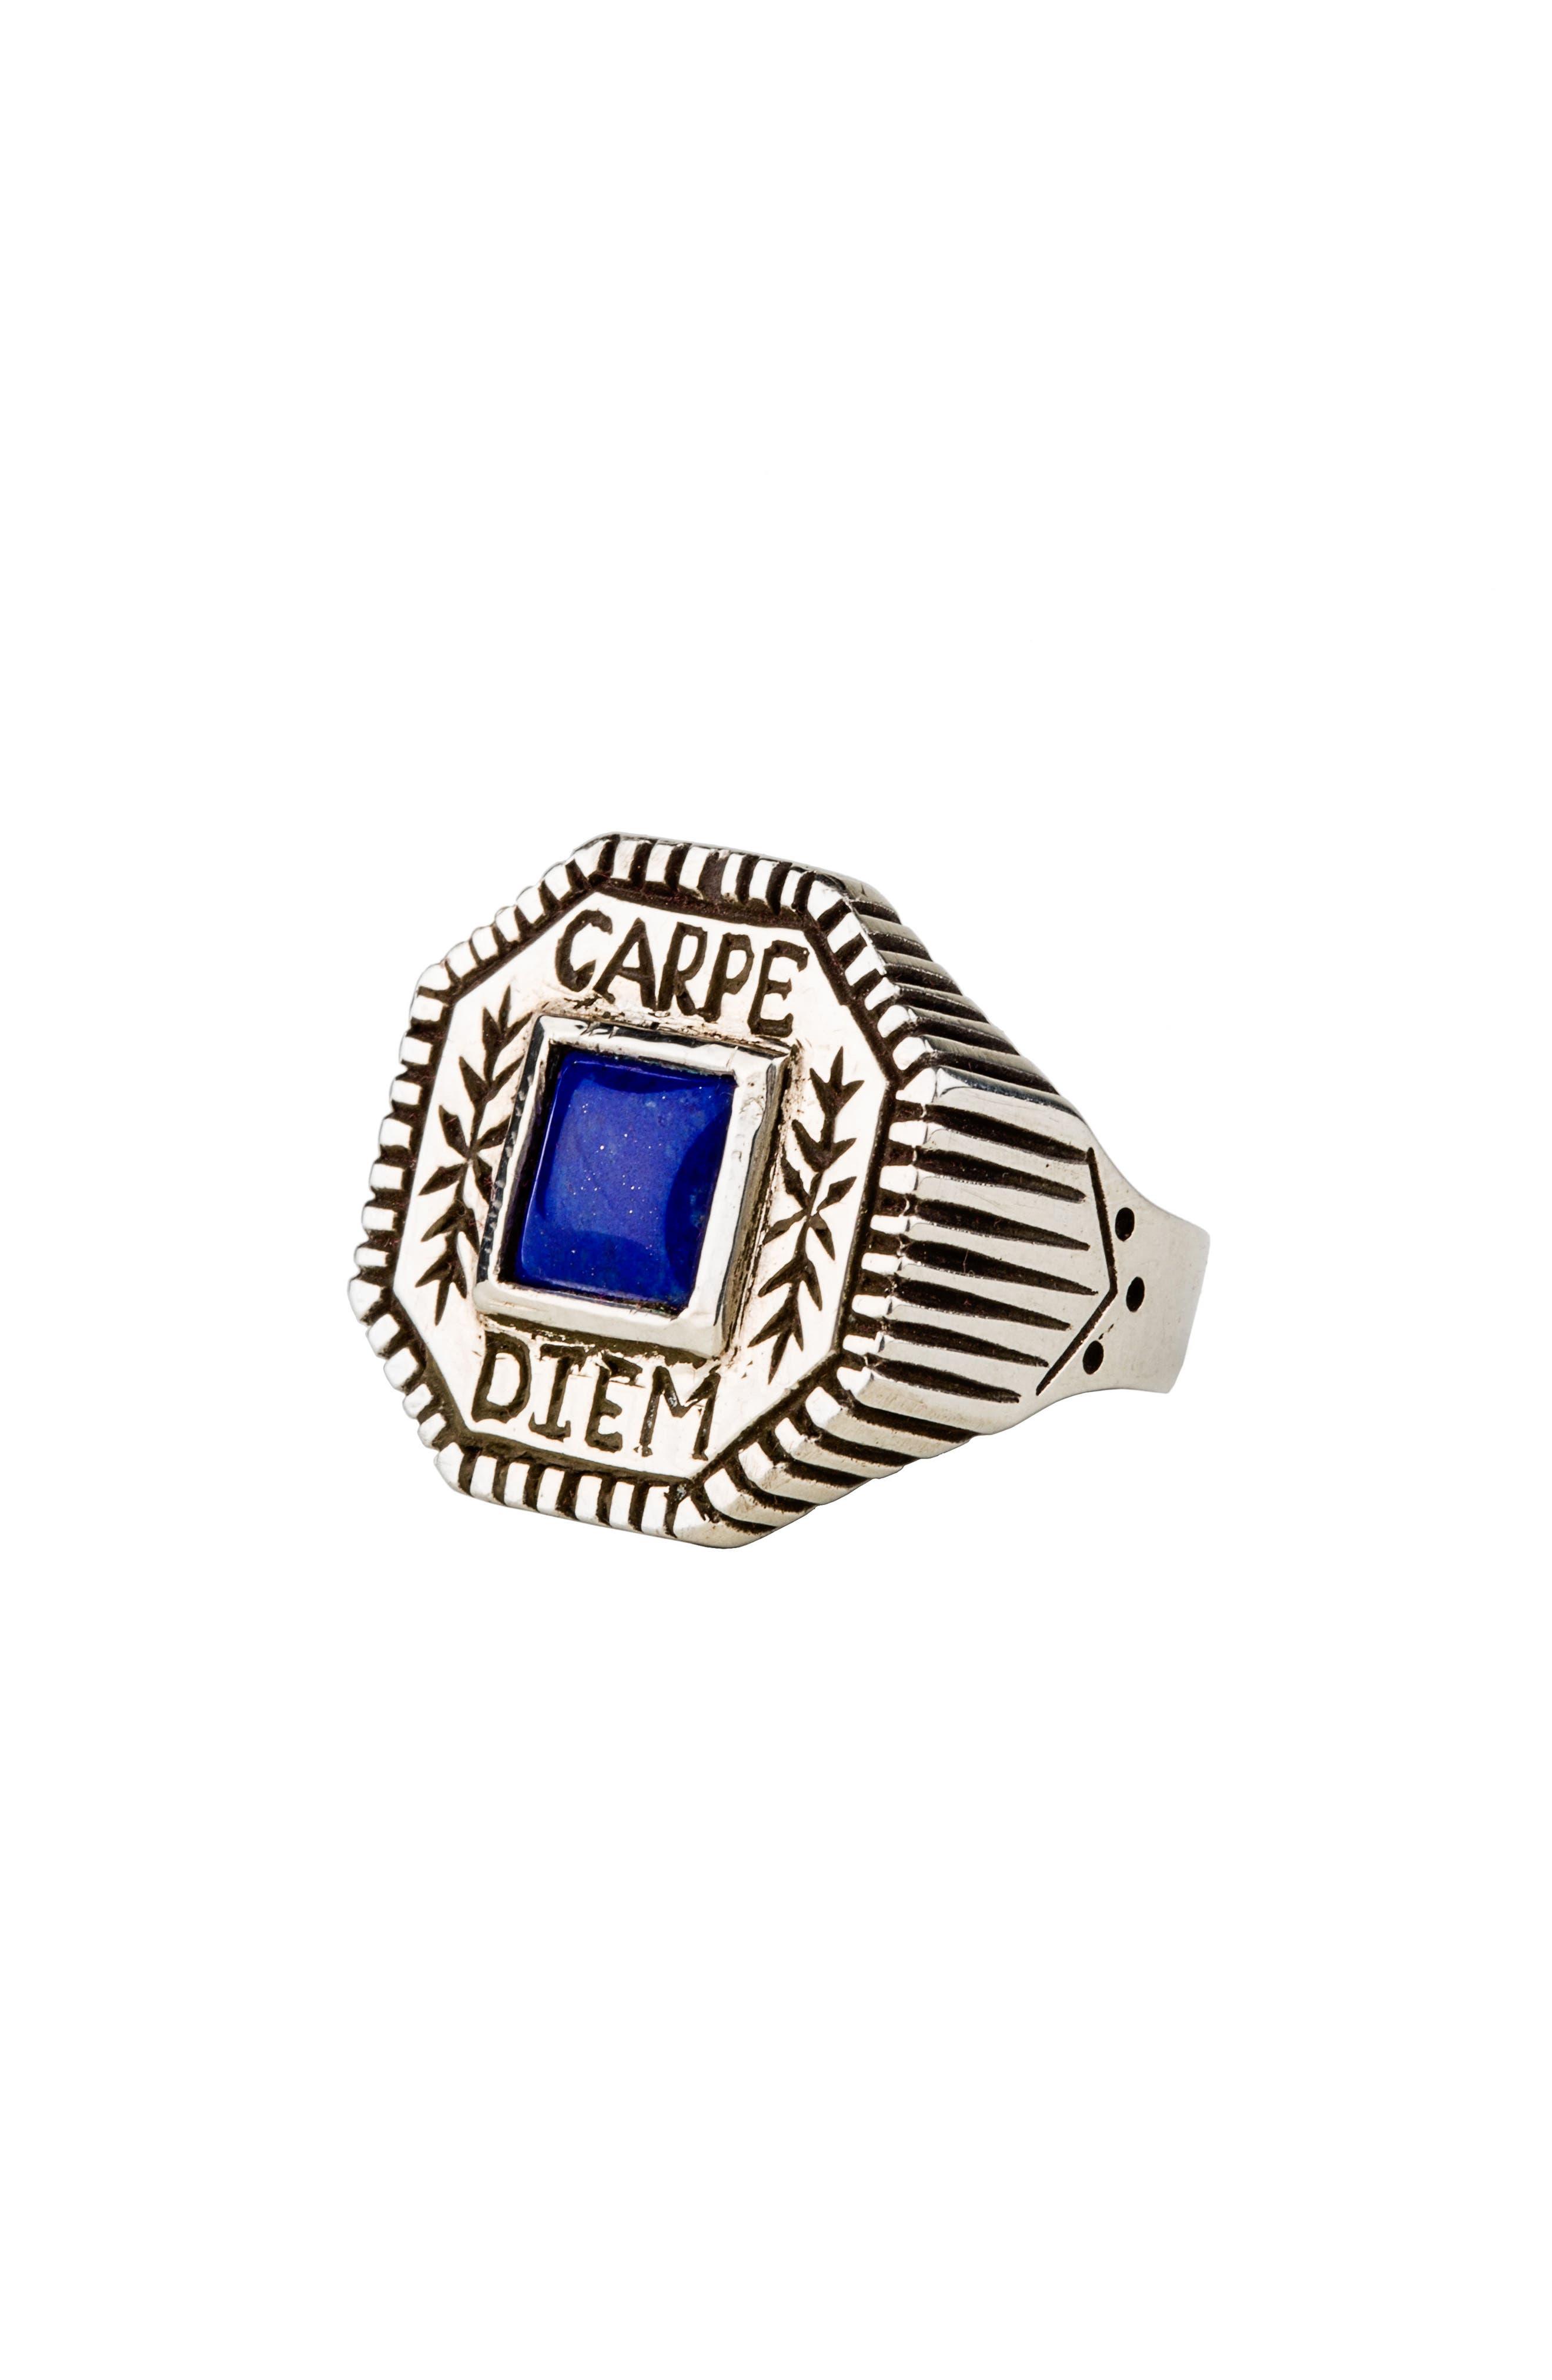 Main Image - Lewis Henry Nicholas Carpe Diem Ring